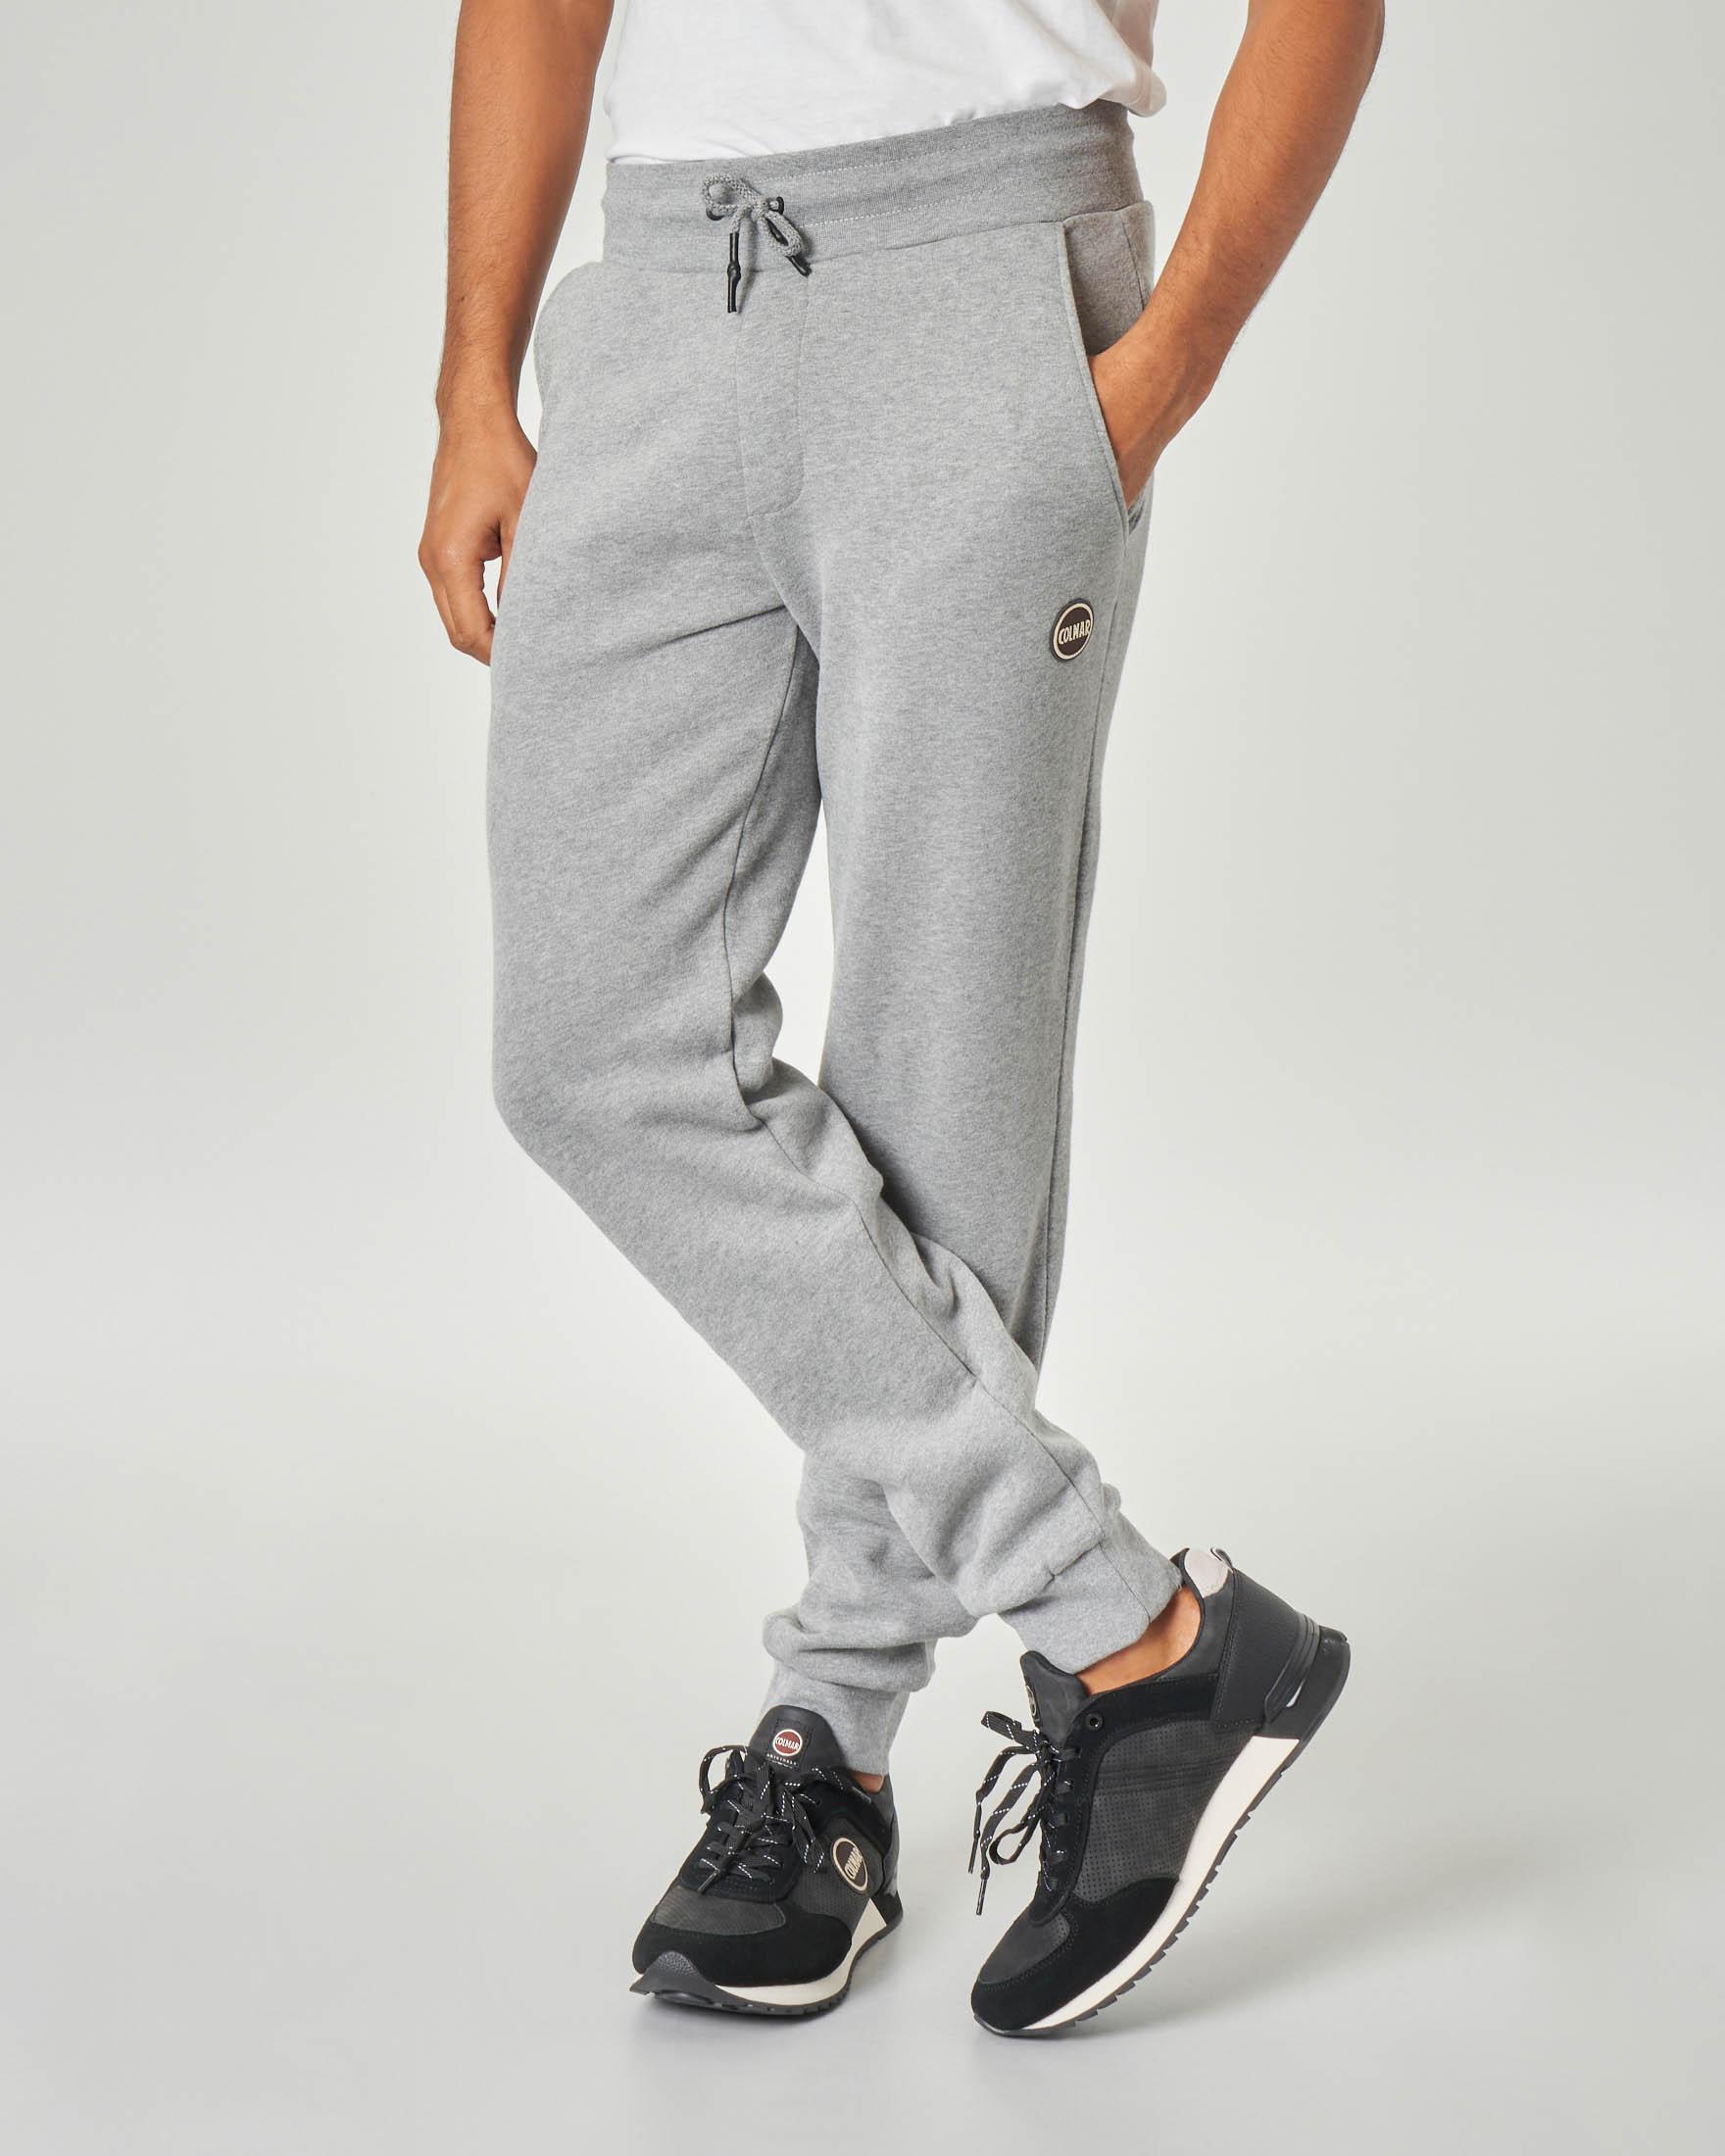 Pantalone grigio chiaro in felpa garzata